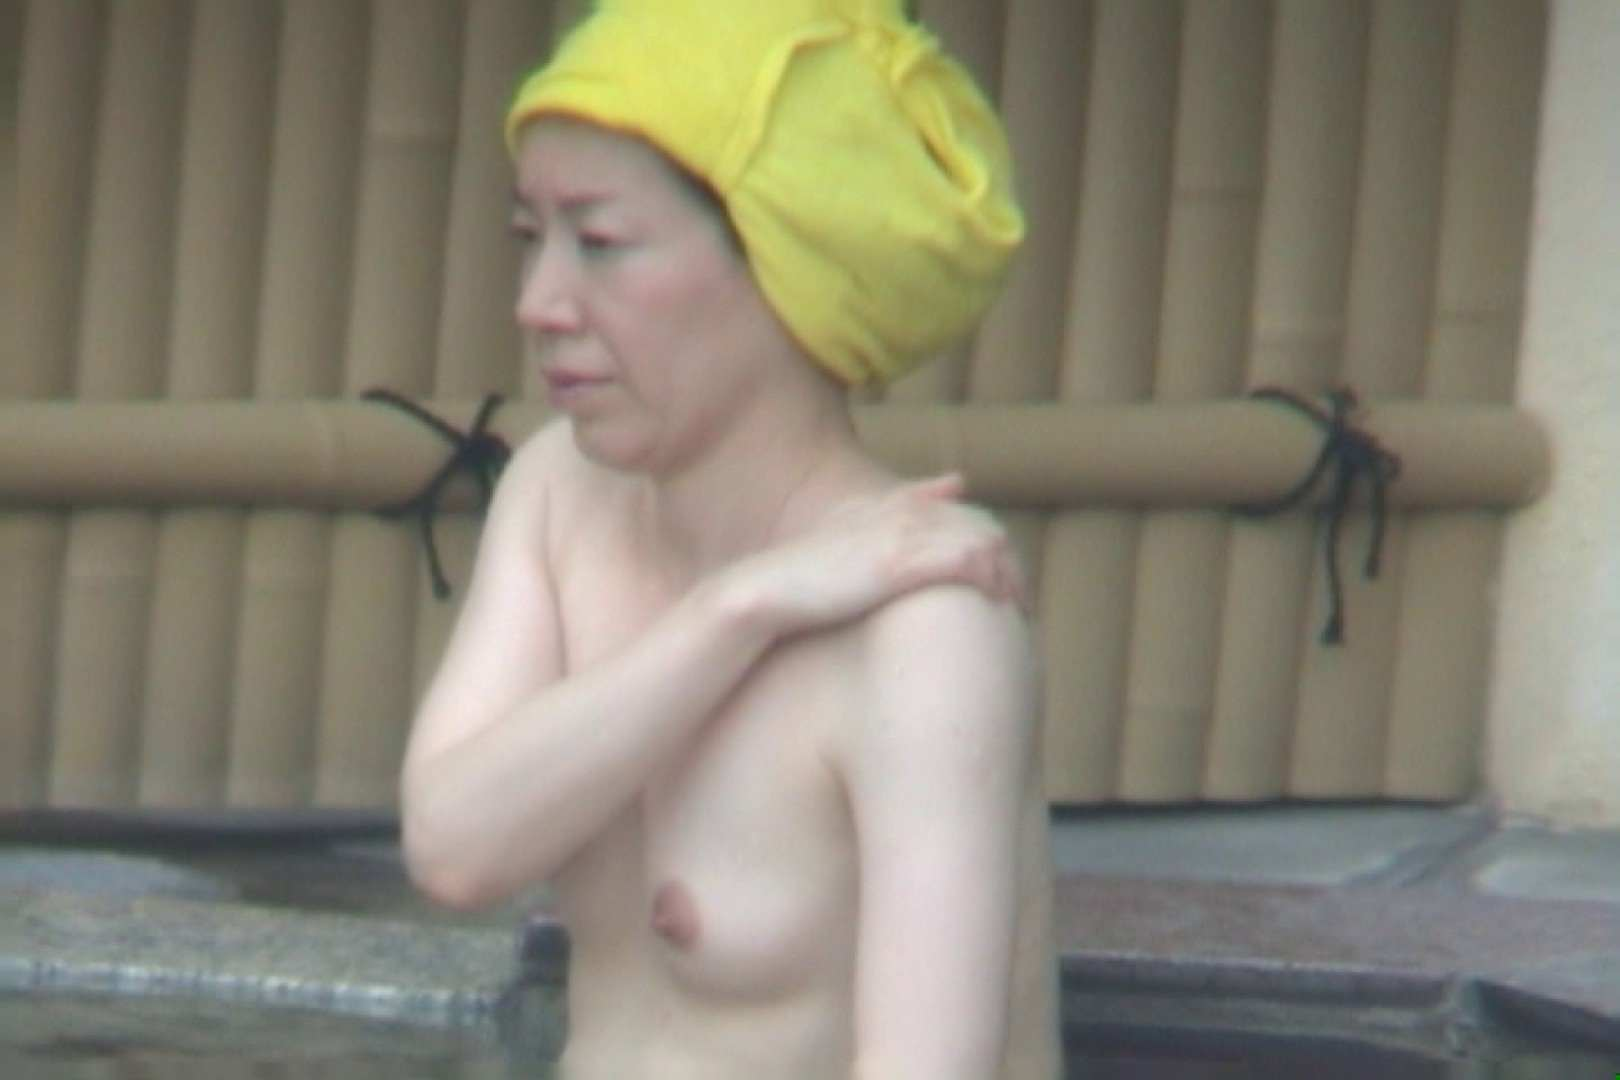 Aquaな露天風呂Vol.569 0 | 0  44連発 41